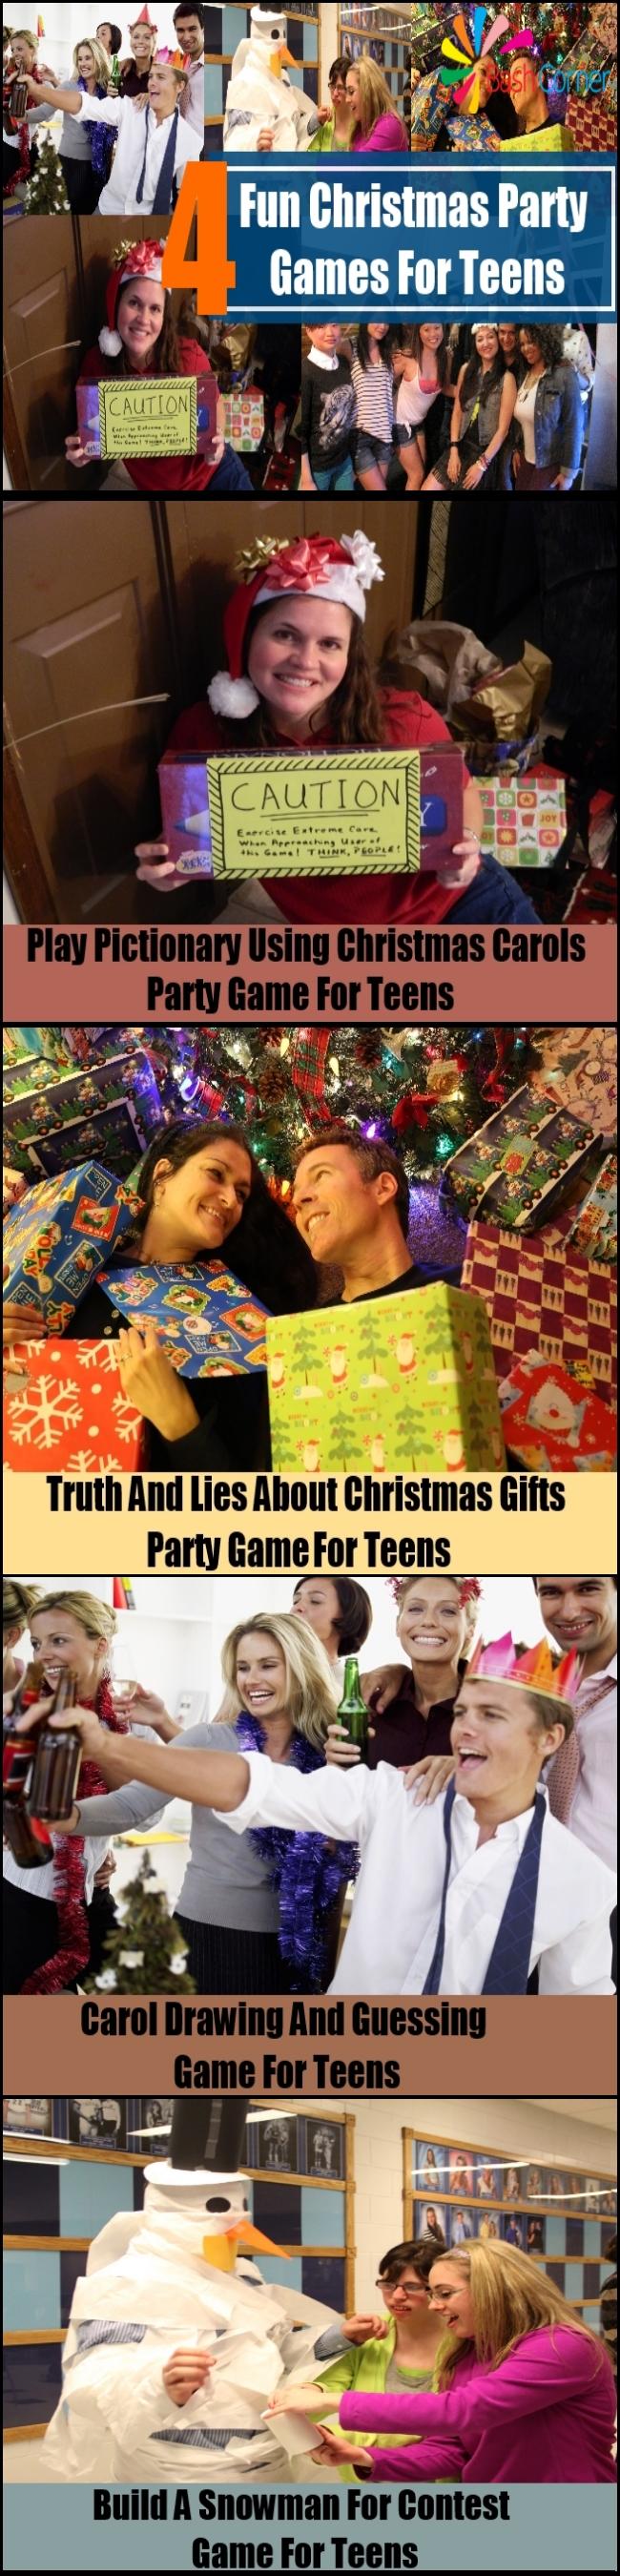 Christmas Party Ideas For Teens.Christmas Party Games 196 Photos Christmas Photos